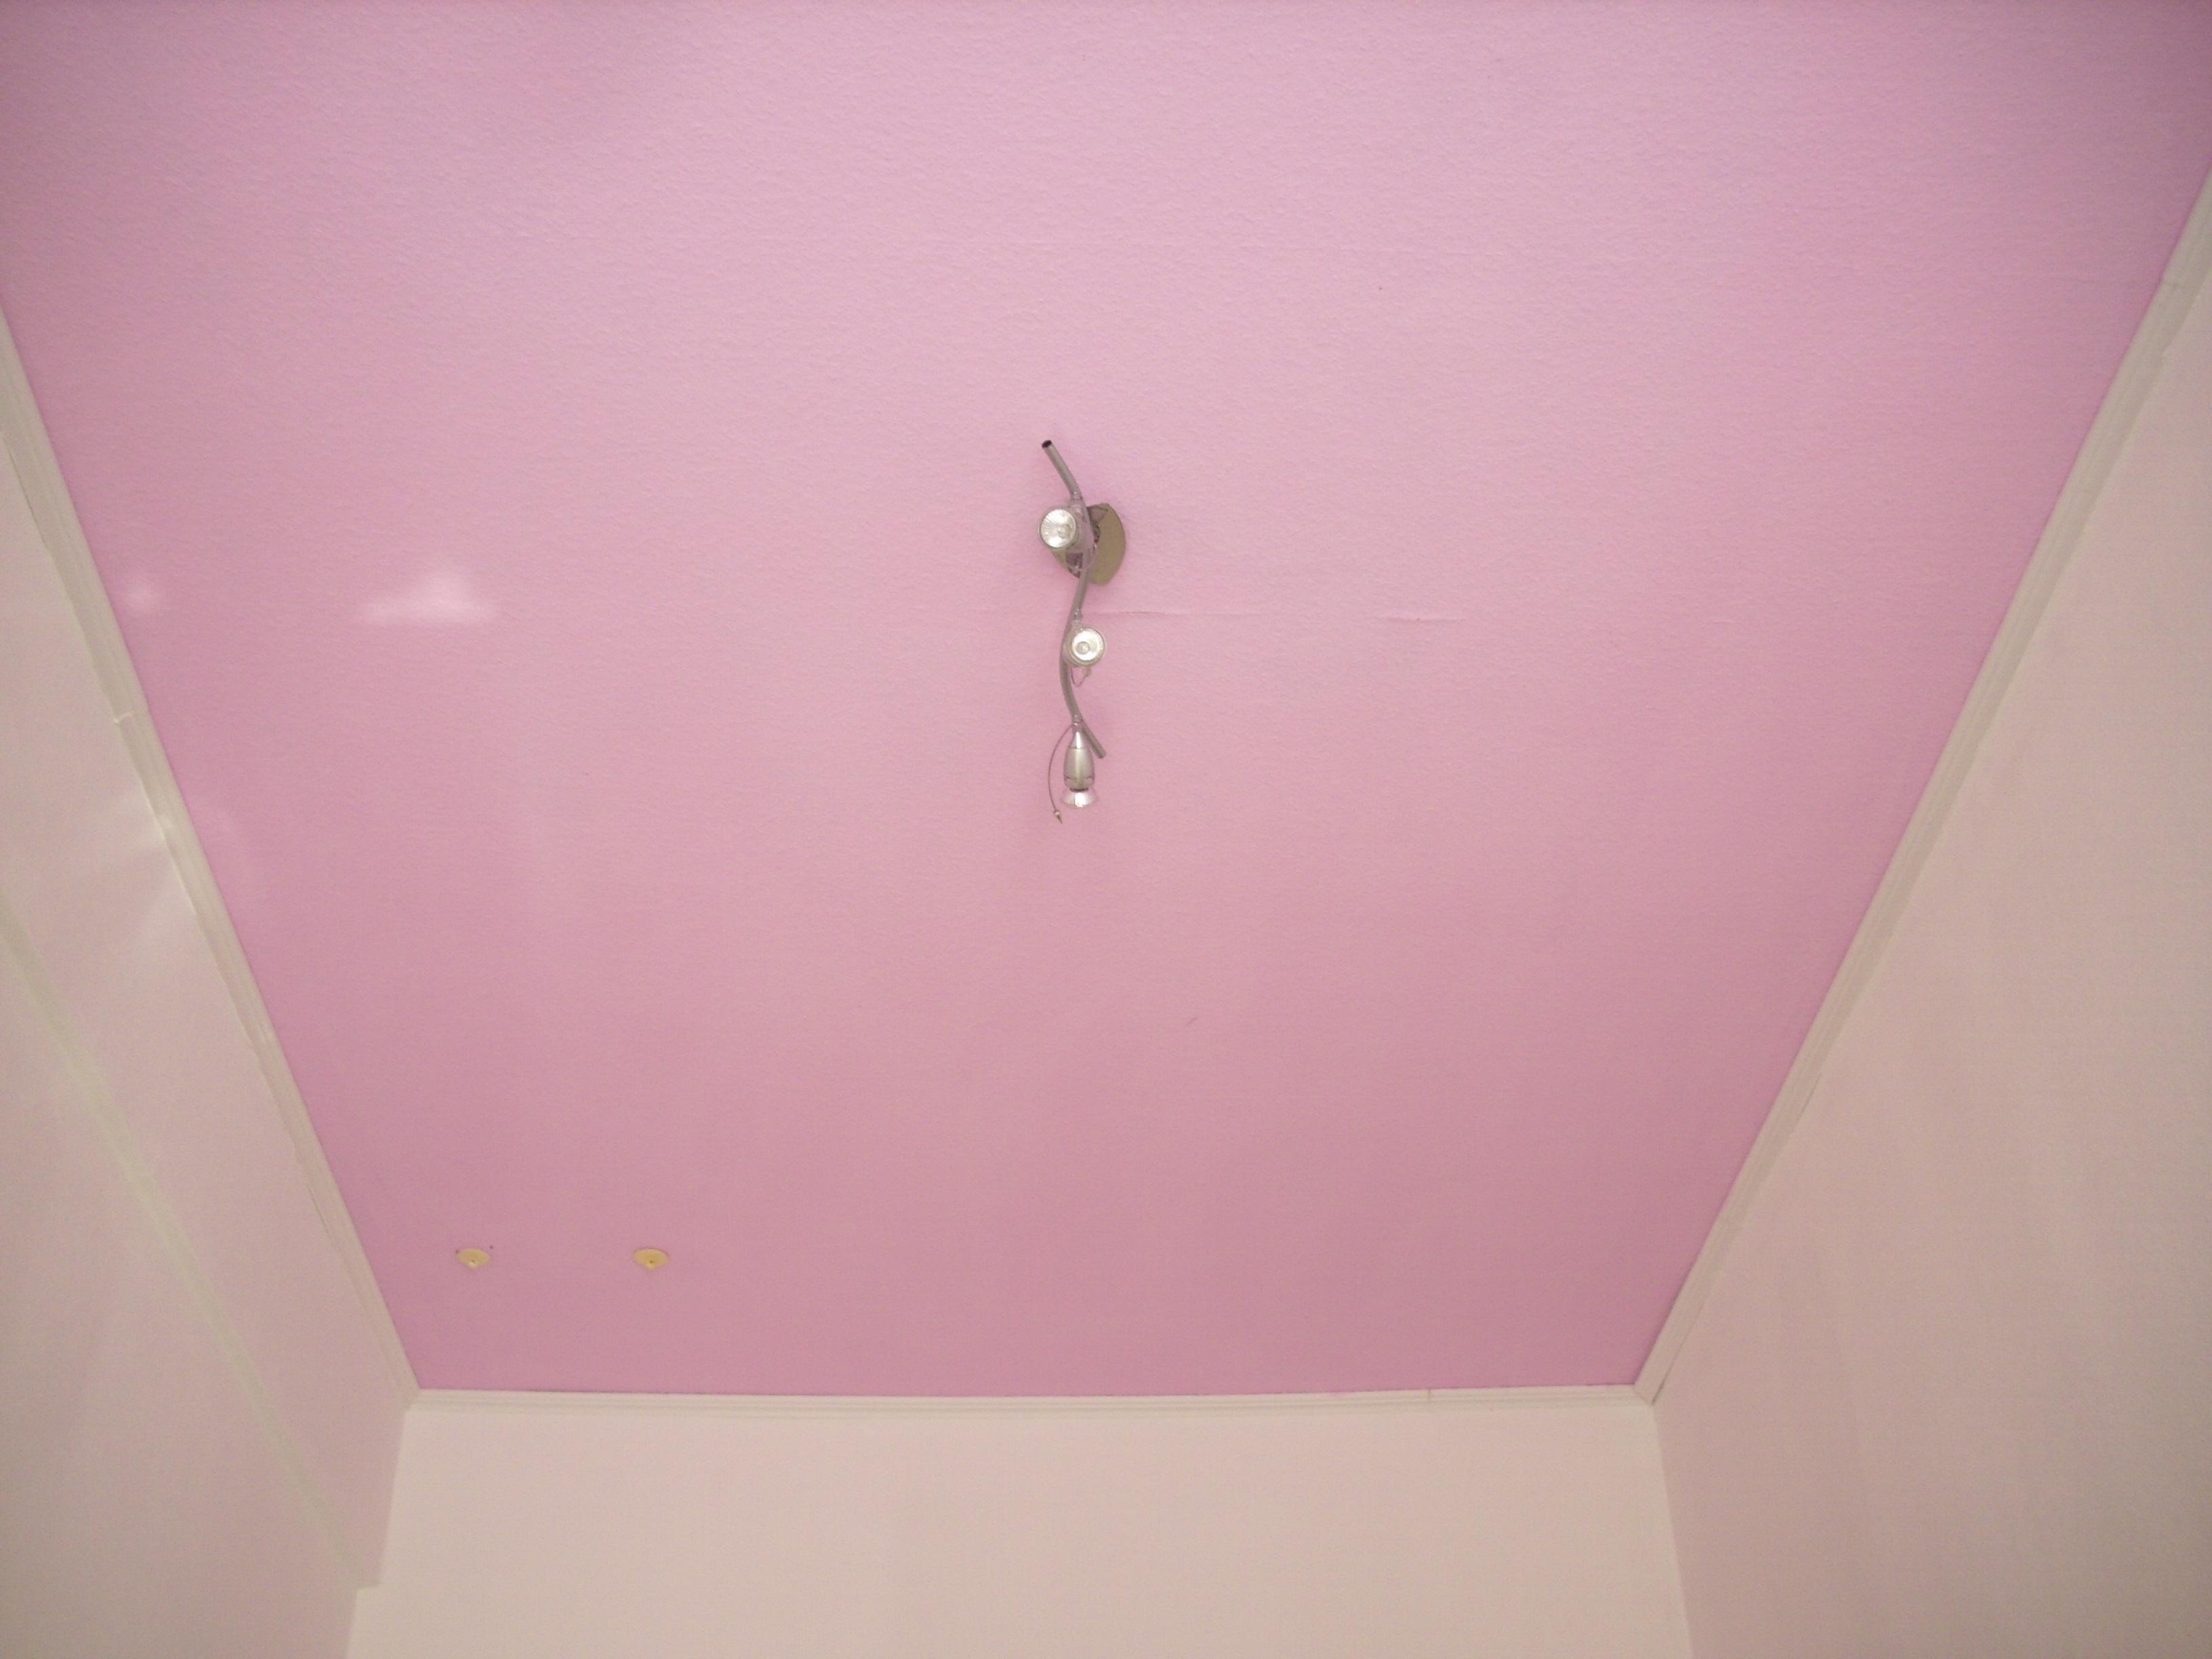 Lacke In Farbe Und Bunt Rosa Irmas Lackwiese